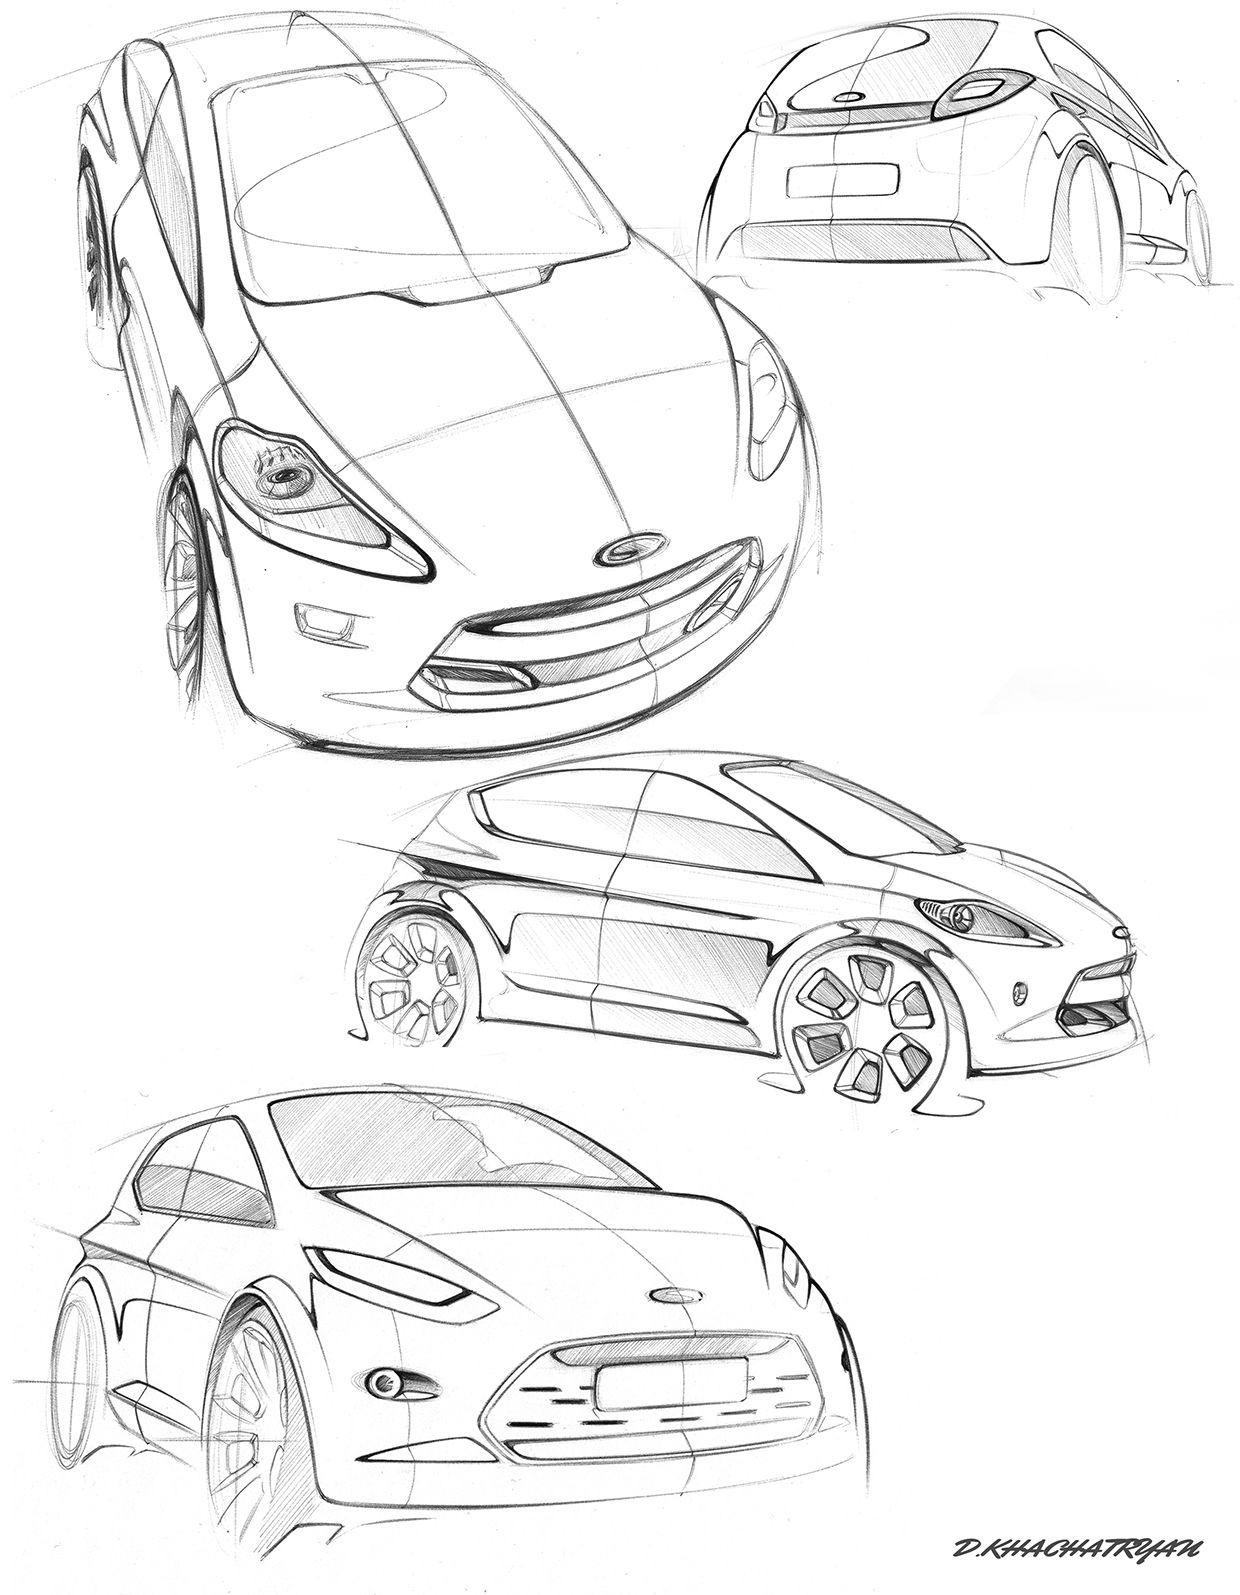 Original 432337 pfgqg962vq8egwpc3dd7a23k0 1434×933 car sketches pinterest sketches car sketch and transportation design